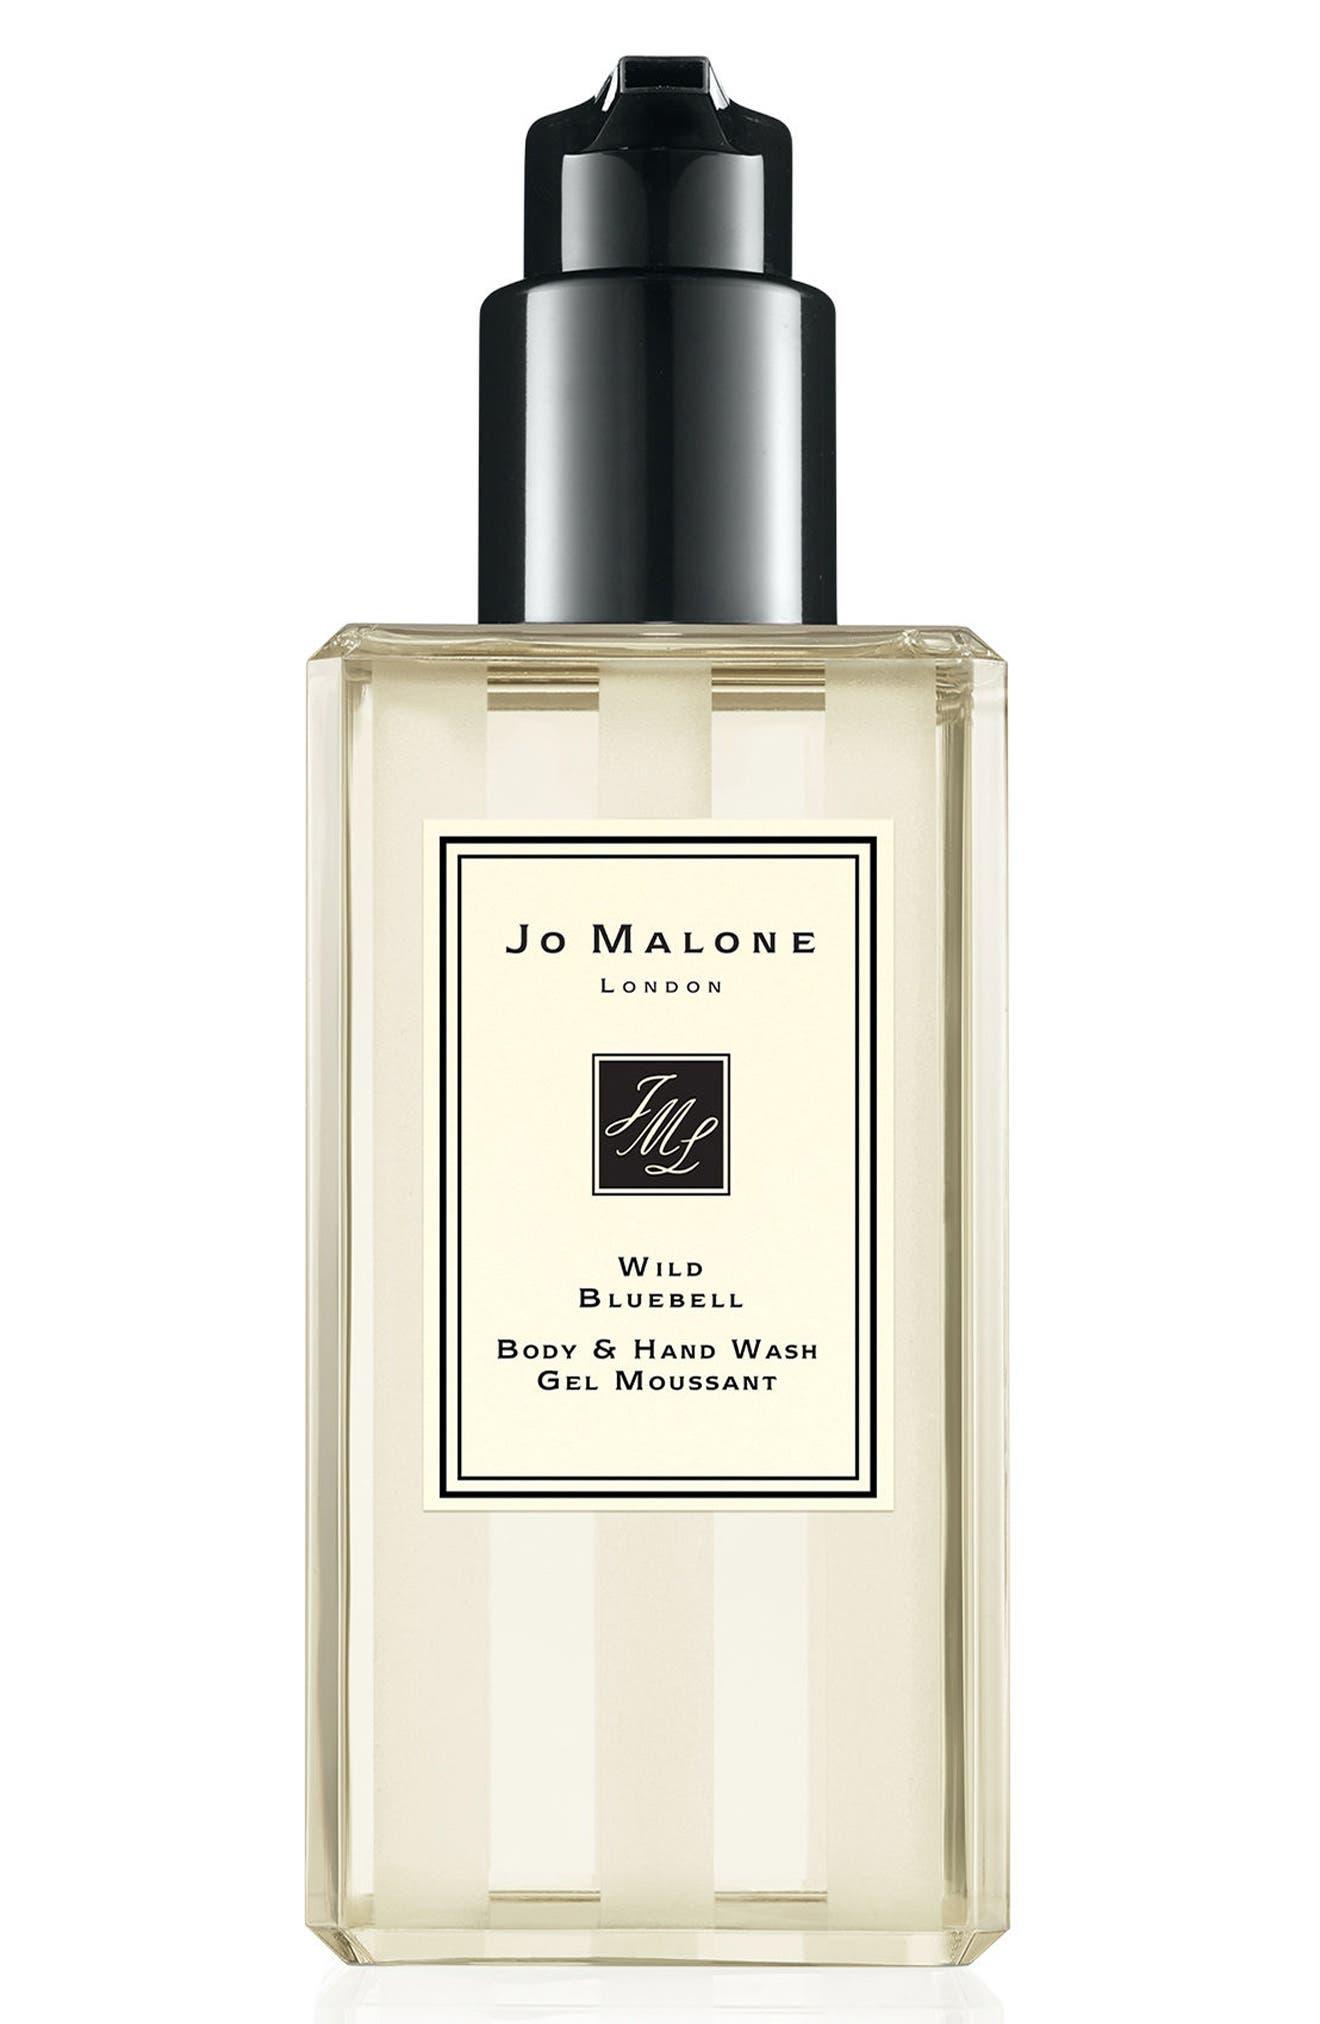 Jo Malone London(TM) Wild Bluebell Body & Hand Wash